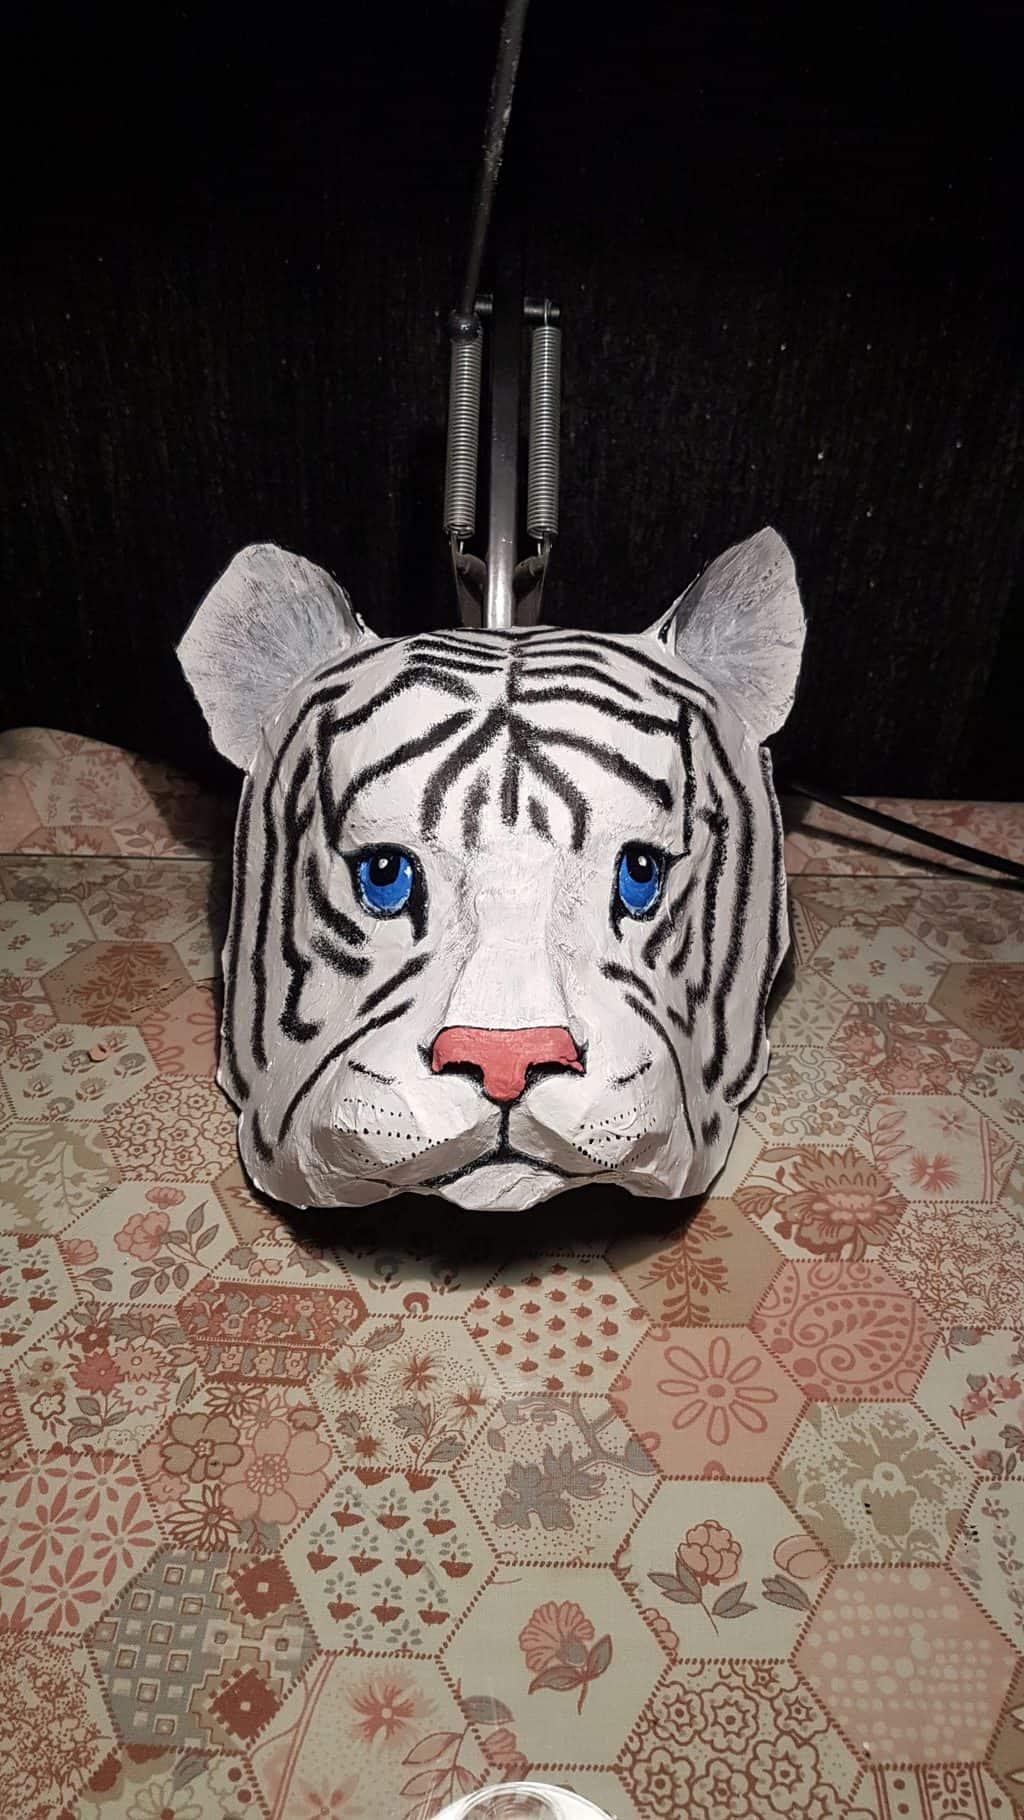 Paper mache tiger cub portrait